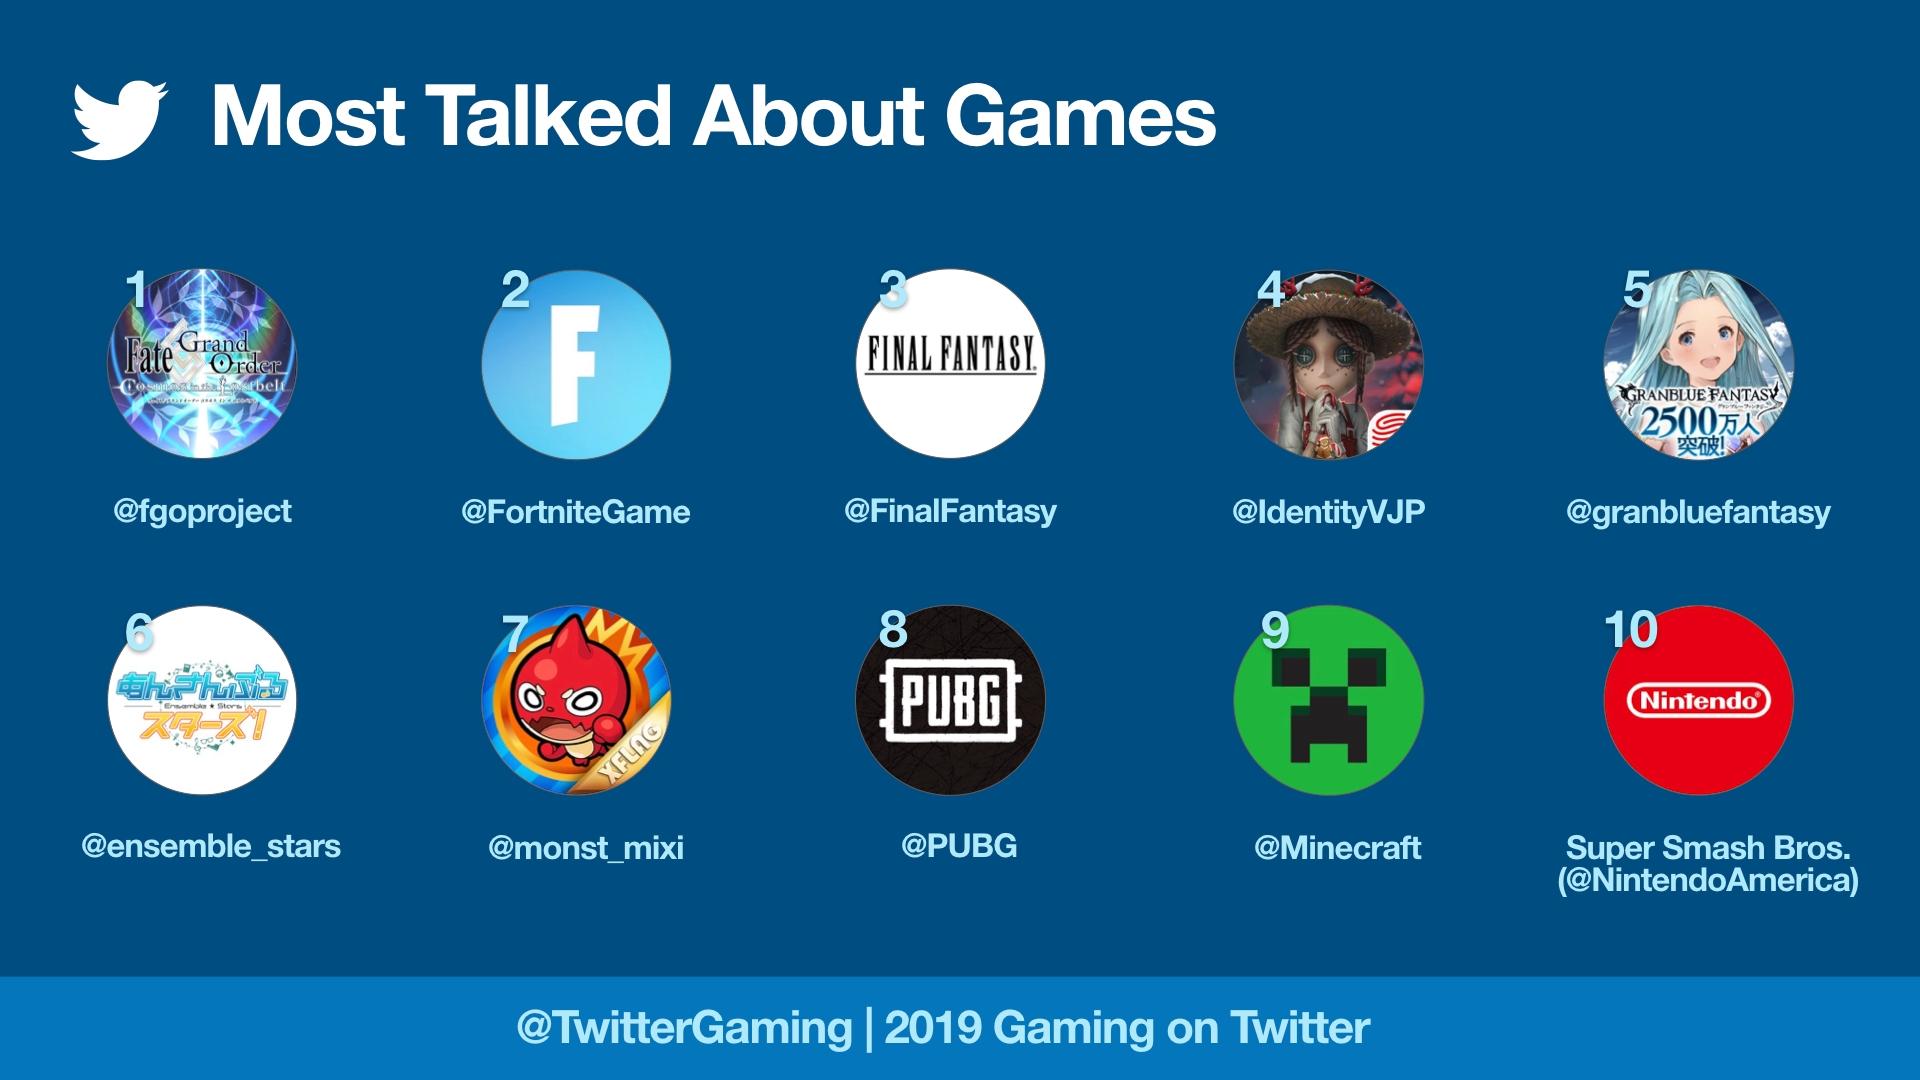 Twitter游戏讨论度排行 日本为最热衷讨论游戏国家